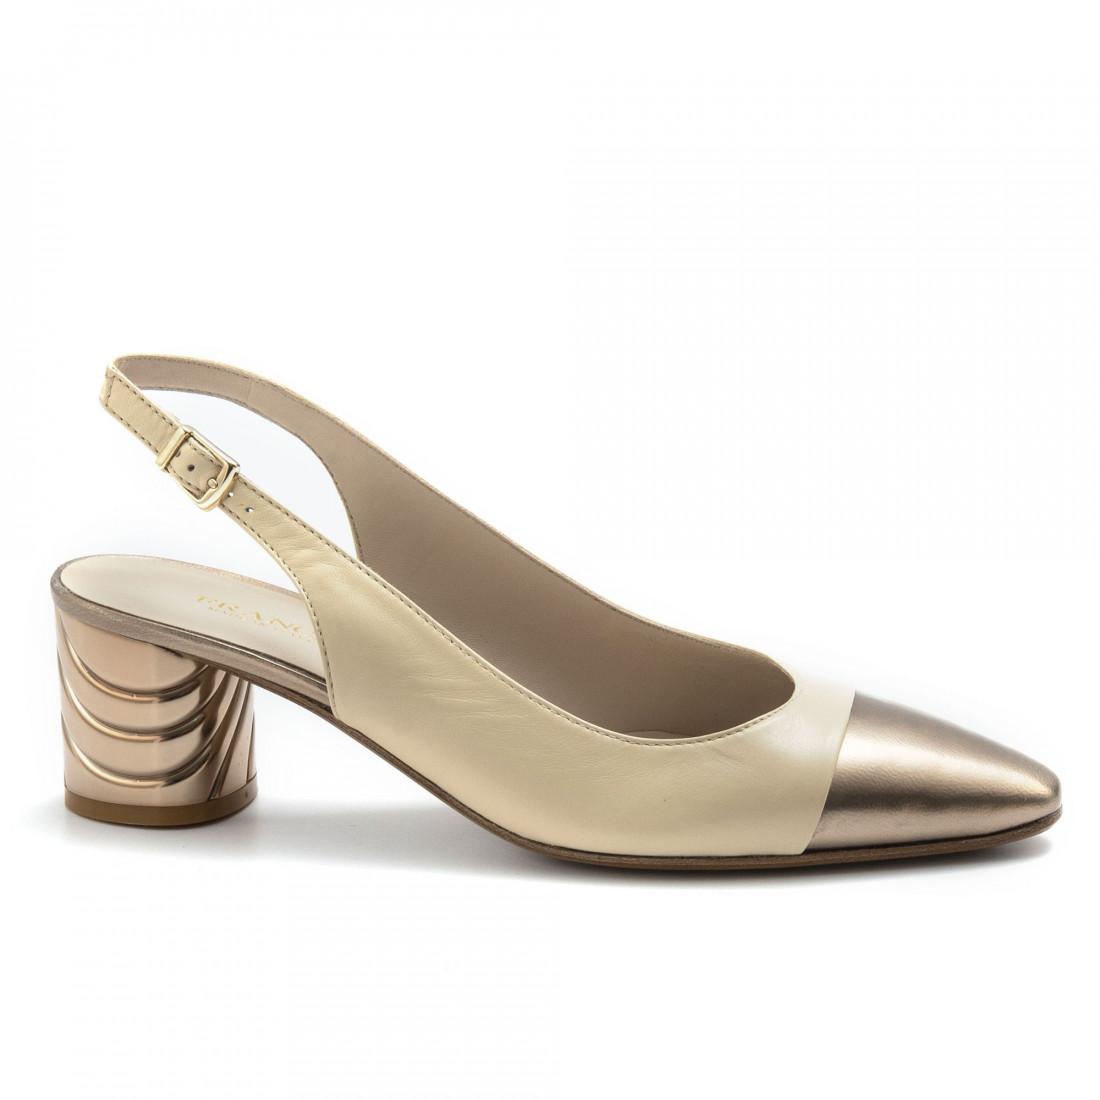 pumps woman franca 3709 617nappa beige opaco rame  4907